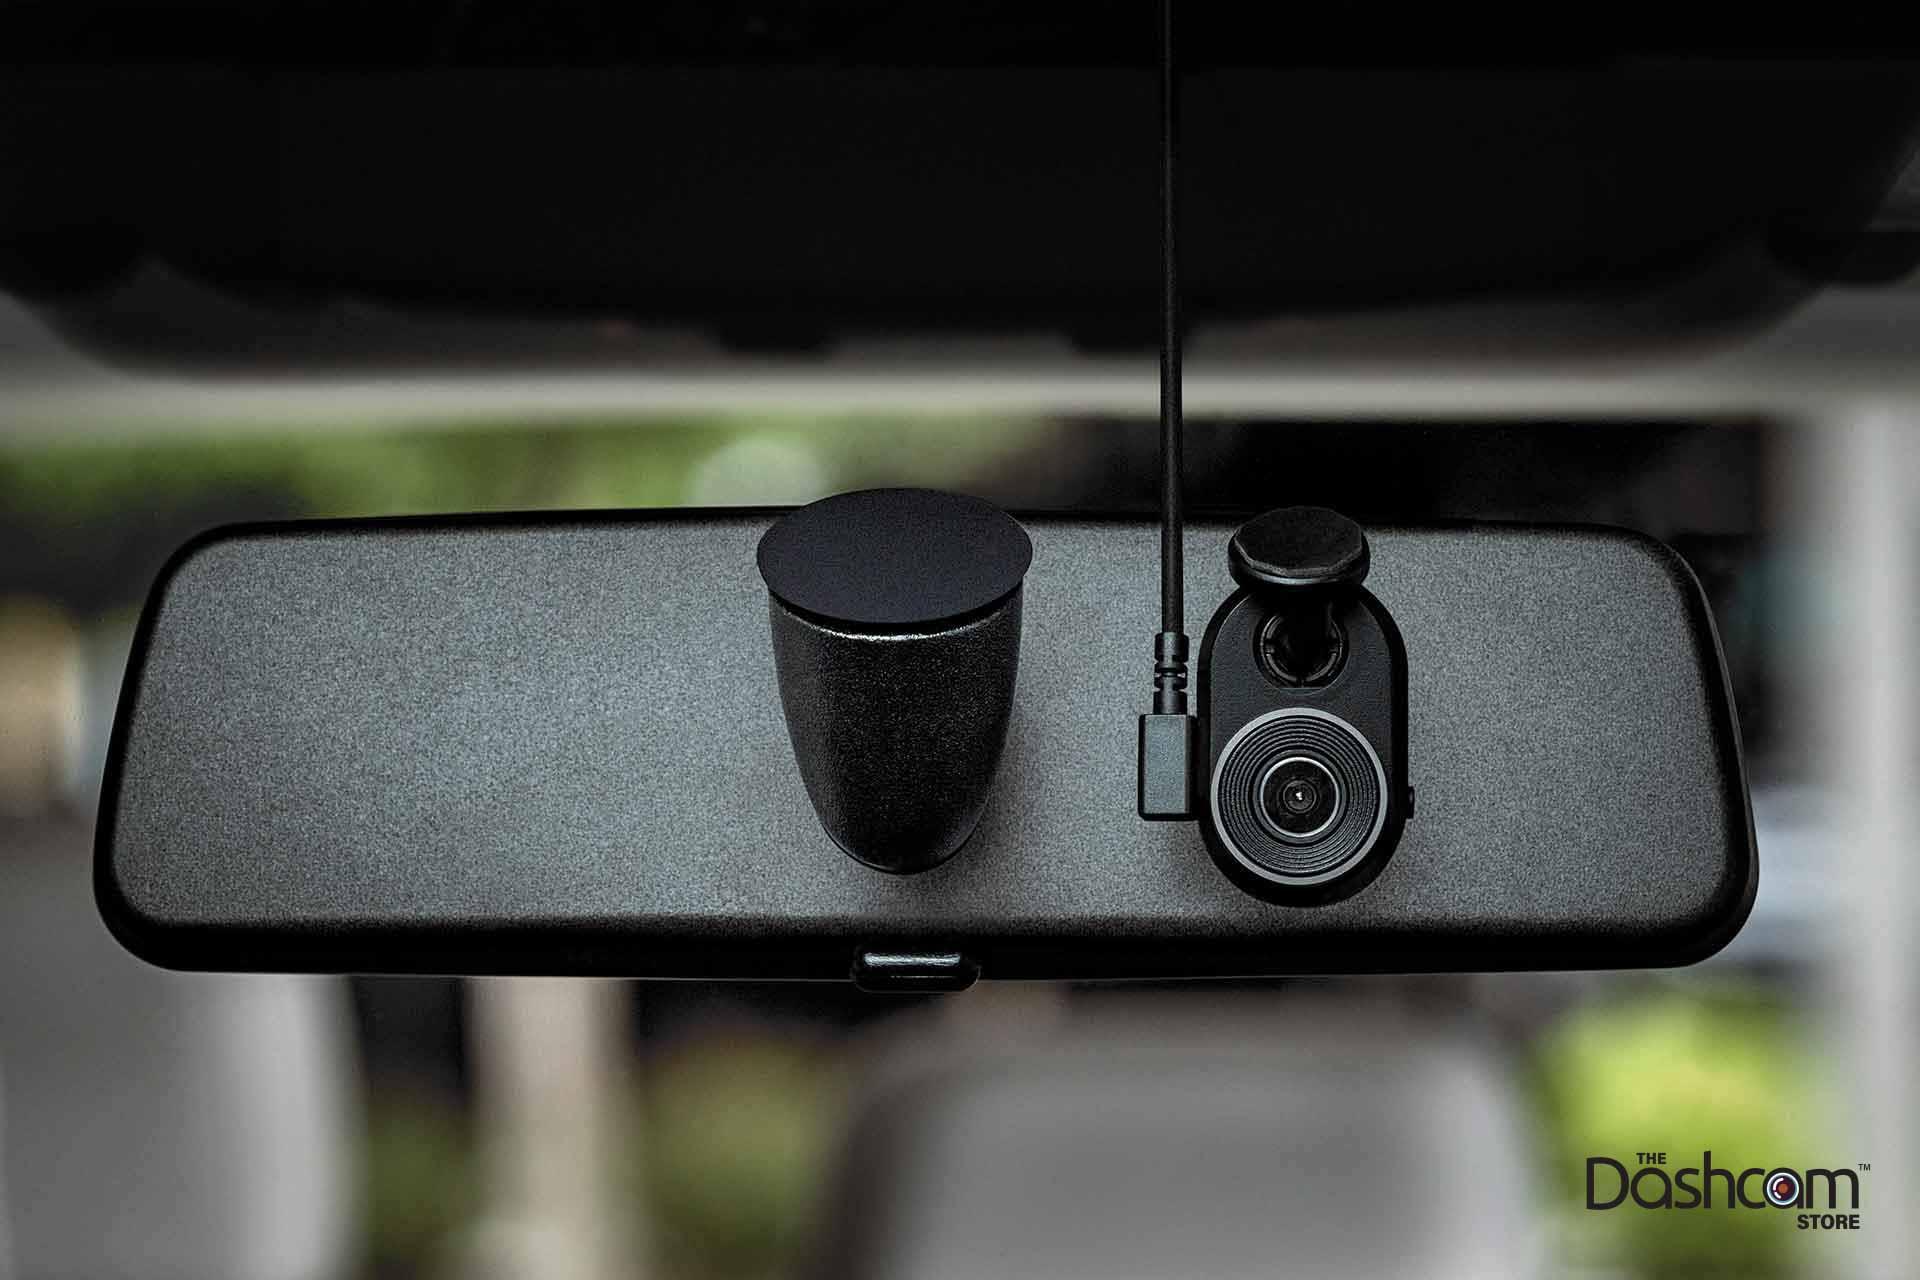 Garmin Dash Cam Mini Super Compact 1080p W Hdr Amp Wifi